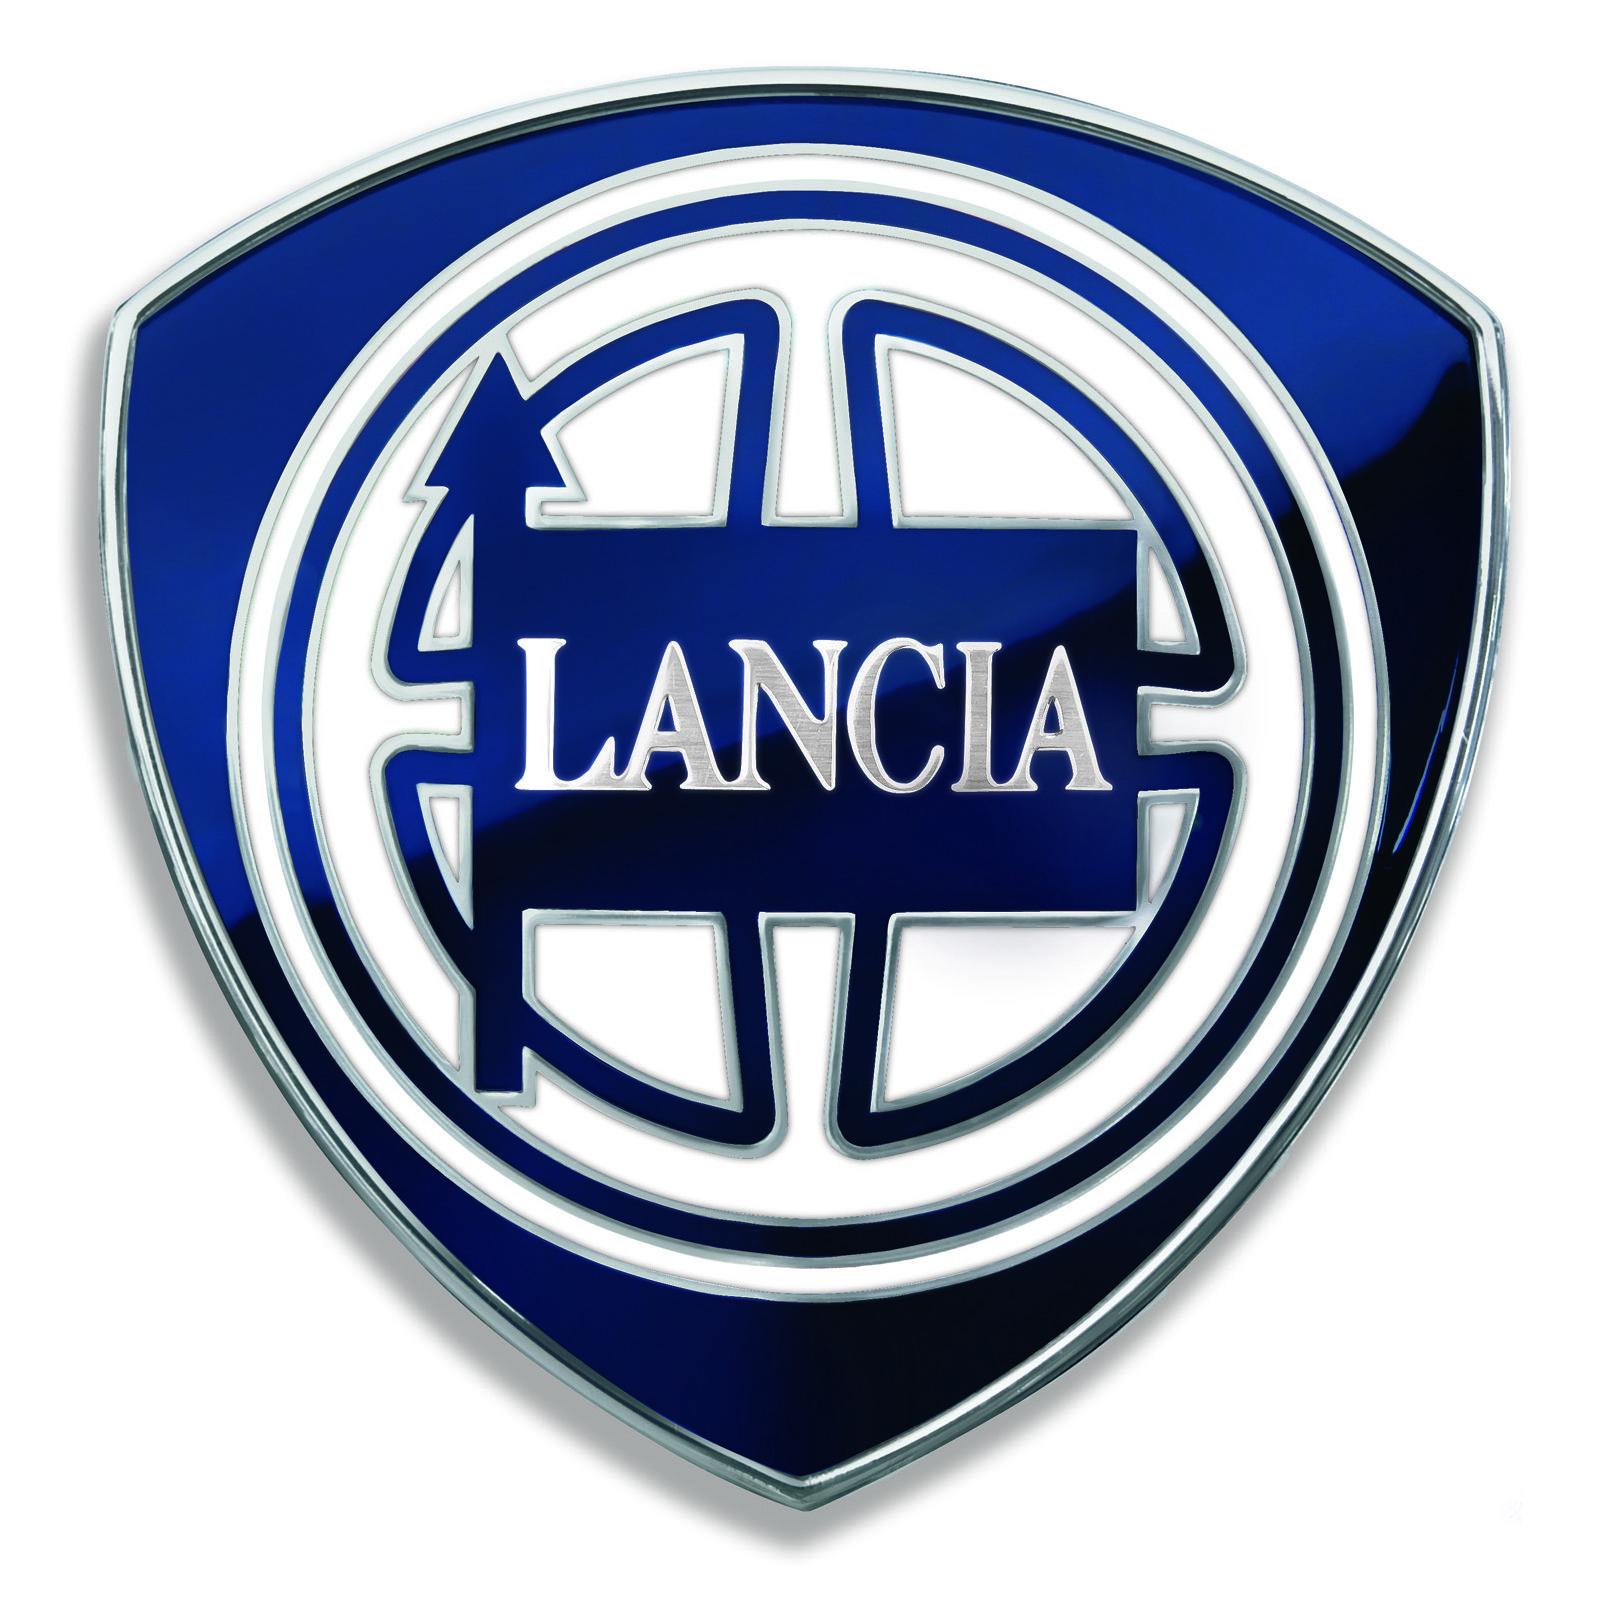 lancia | favorite products | pinterest | car logos, logos and buick logo